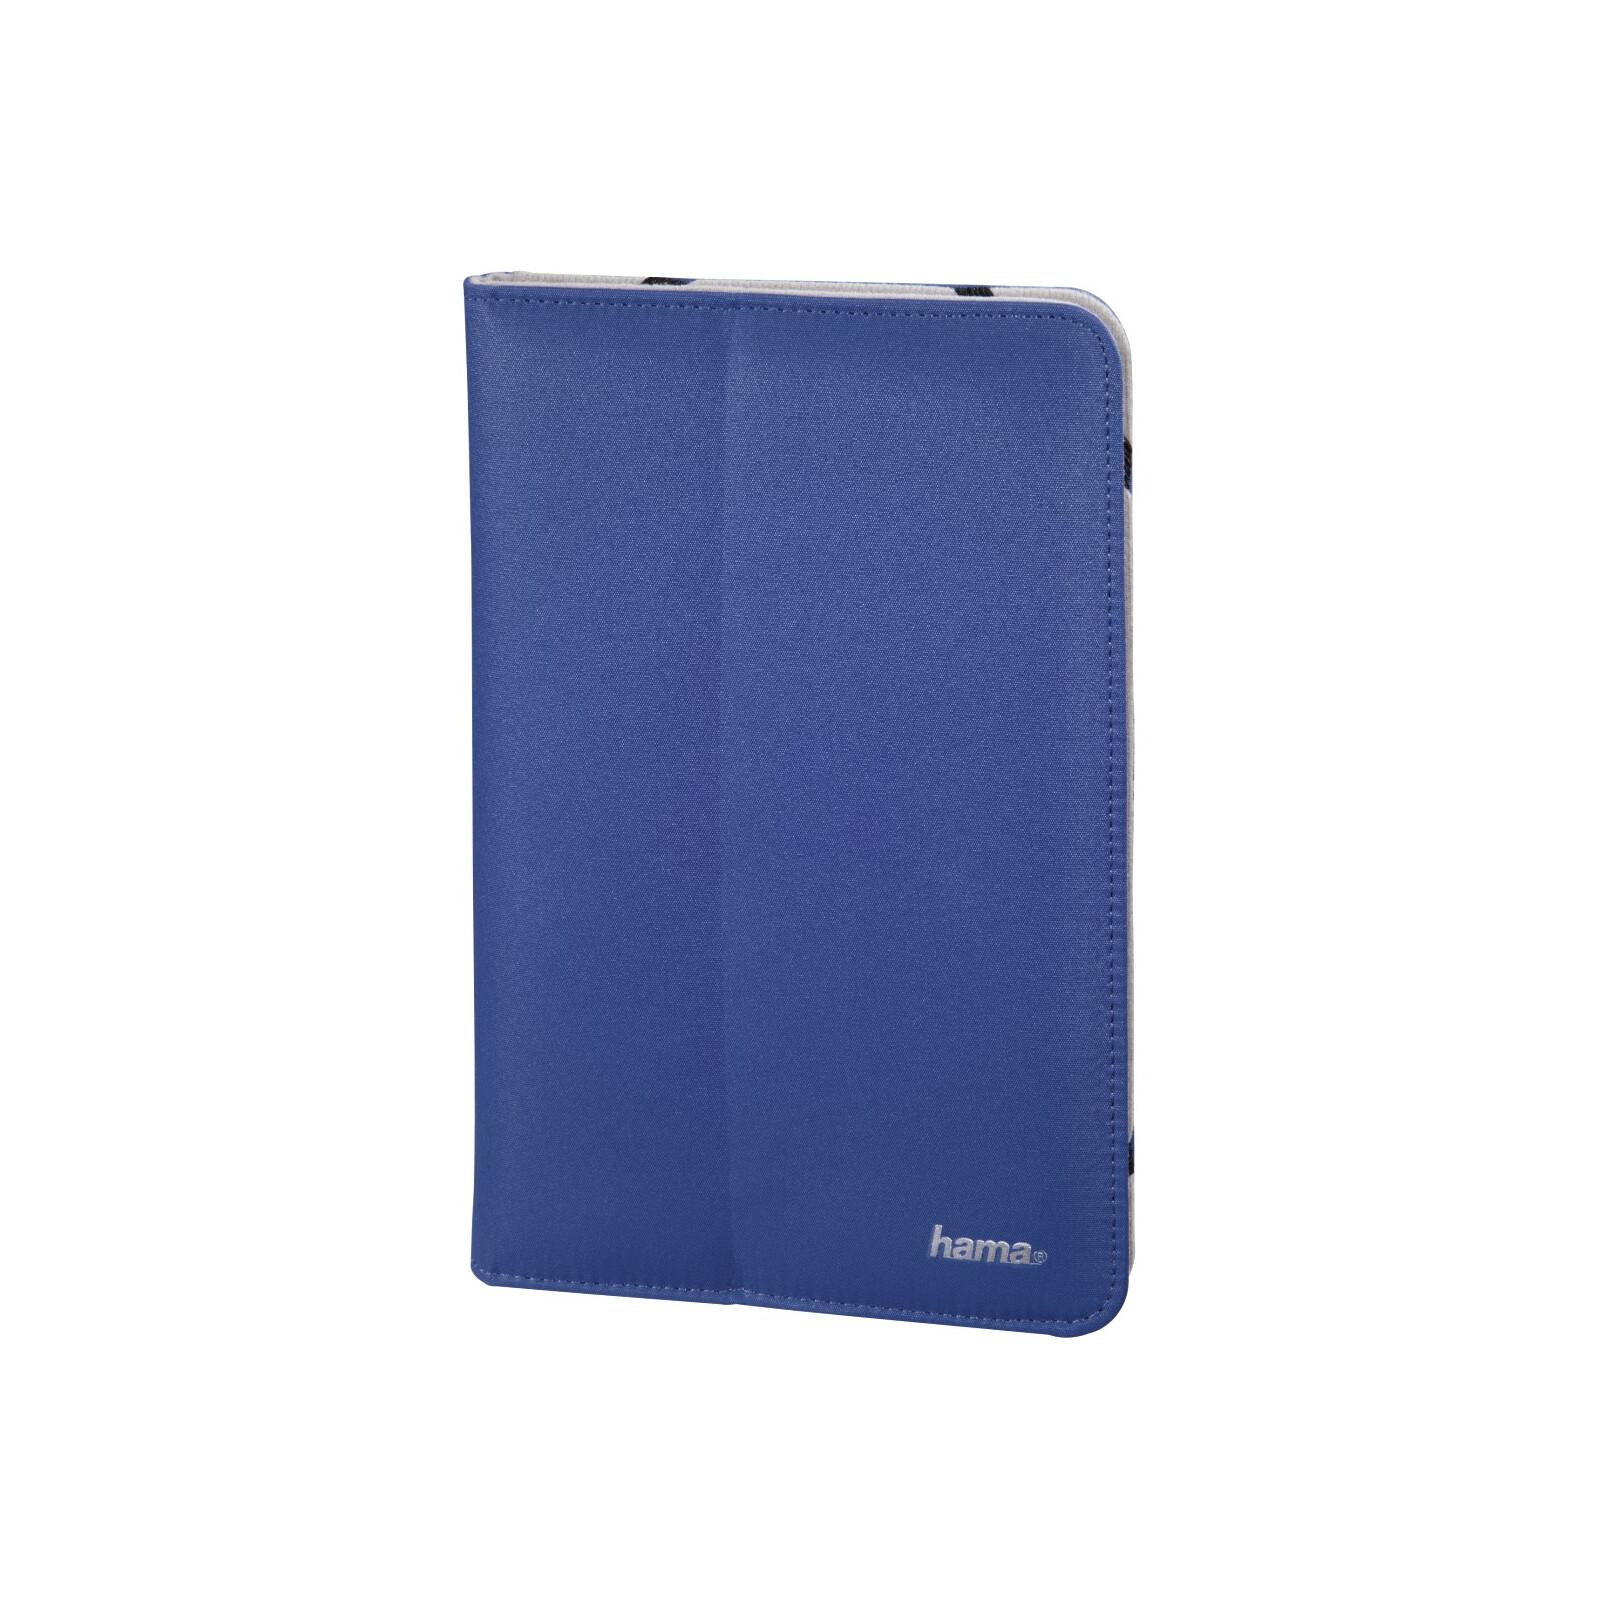 Hama Book Tasche Strap Tab 25,6cm